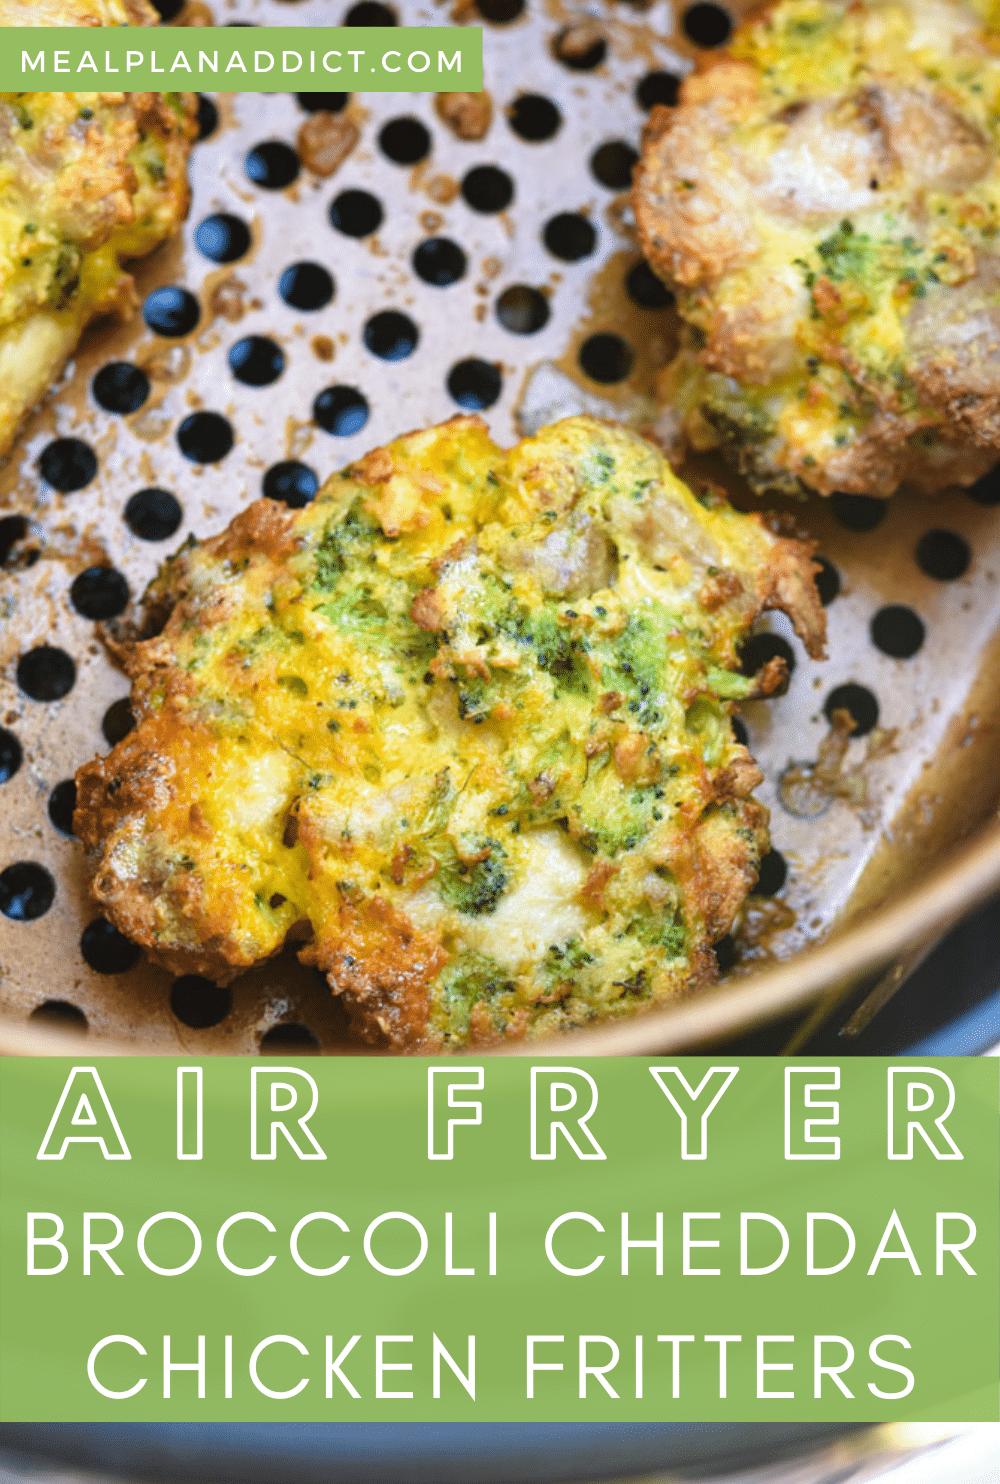 Air Fryer Broccoli Cheddar Chicken Fritter Recipe | Meal Plan Addict